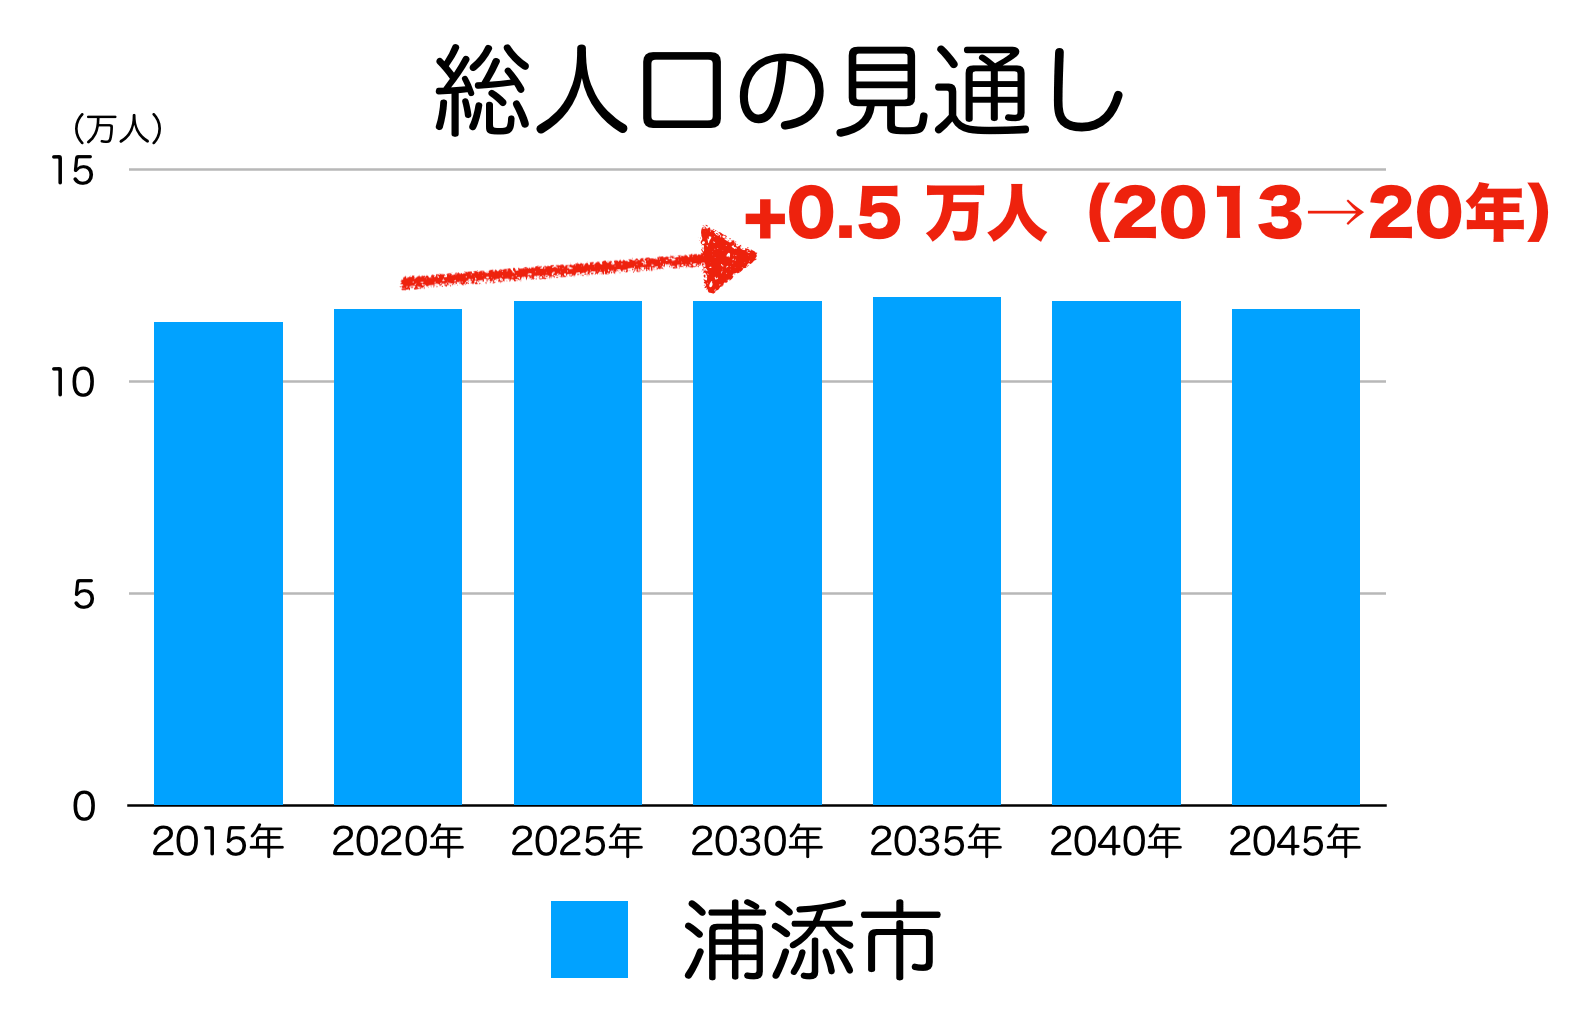 浦添市の人口予測